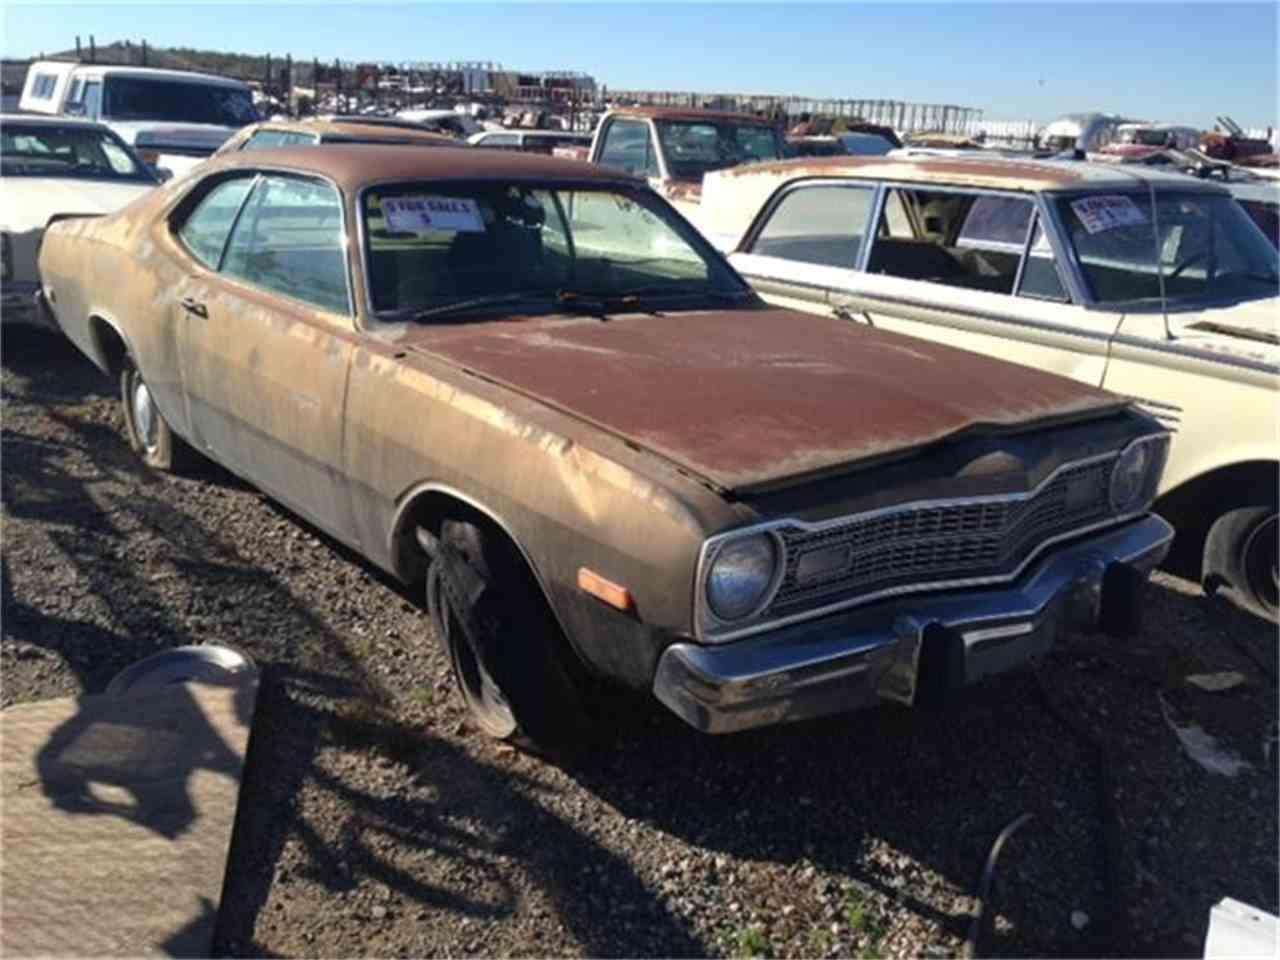 Houston Dodge Dealers >> 1974 Dodge Dart for Sale | ClassicCars.com | CC-618749